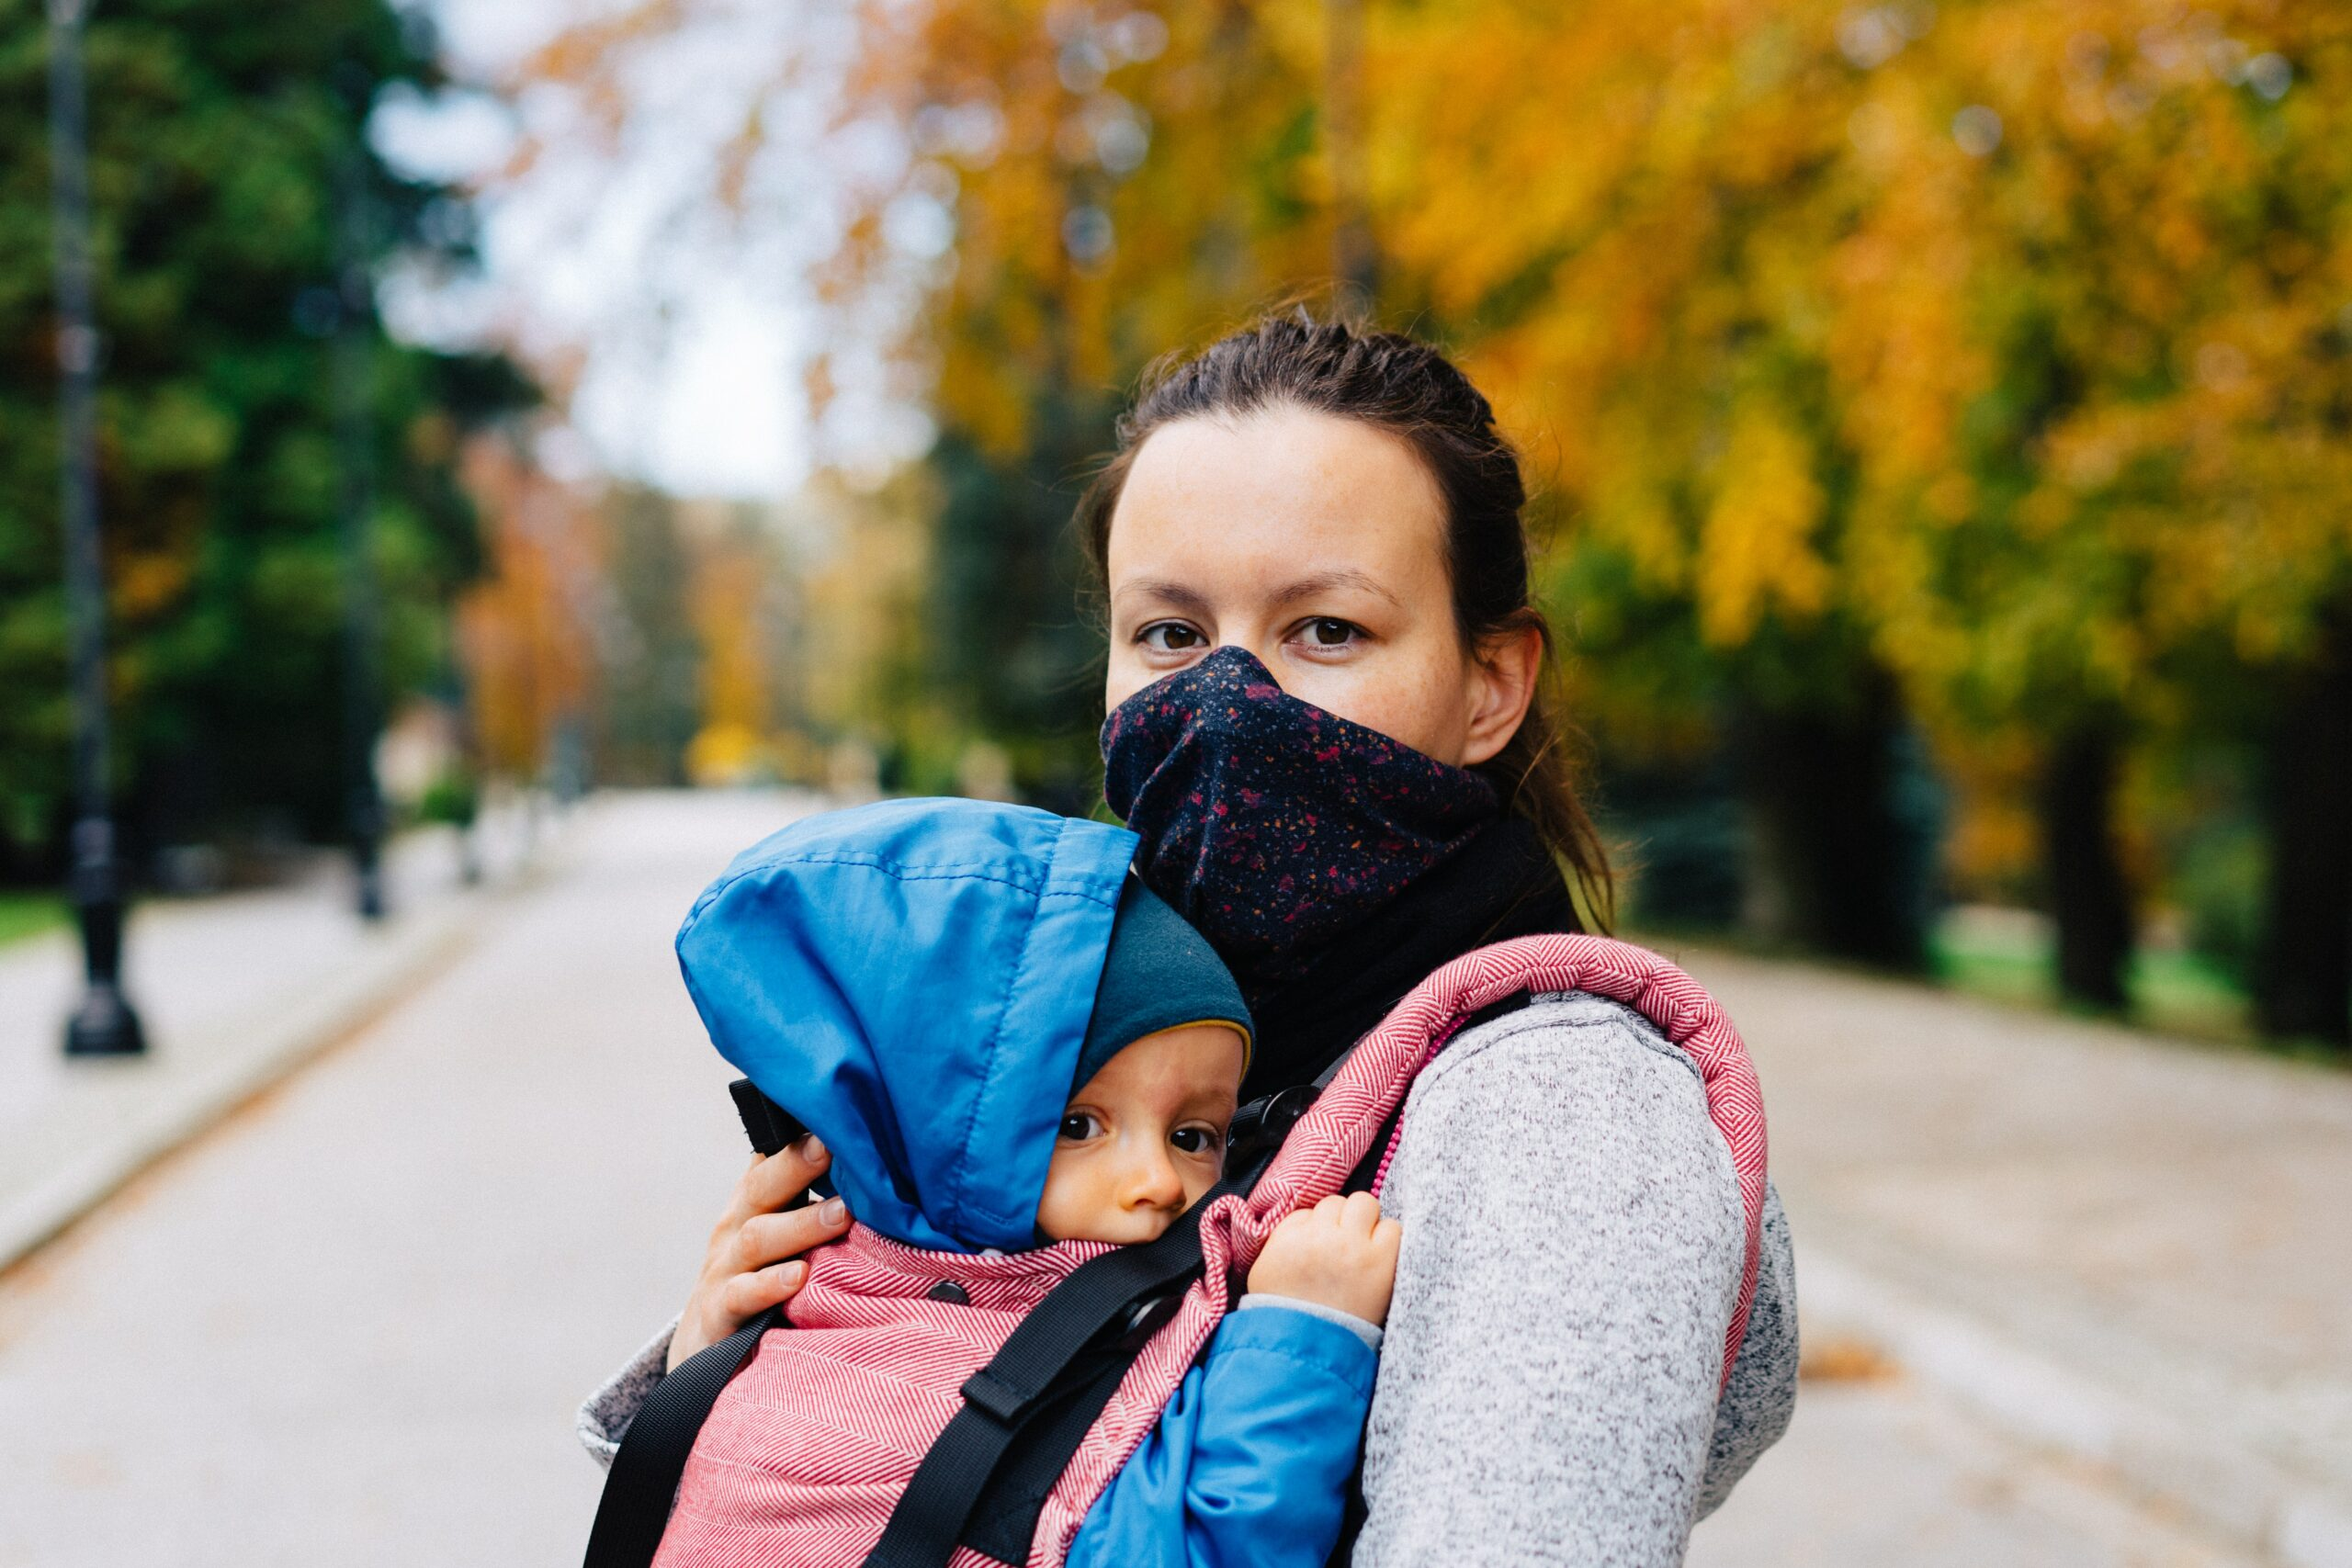 Lockdown has made motherhood even more challenging